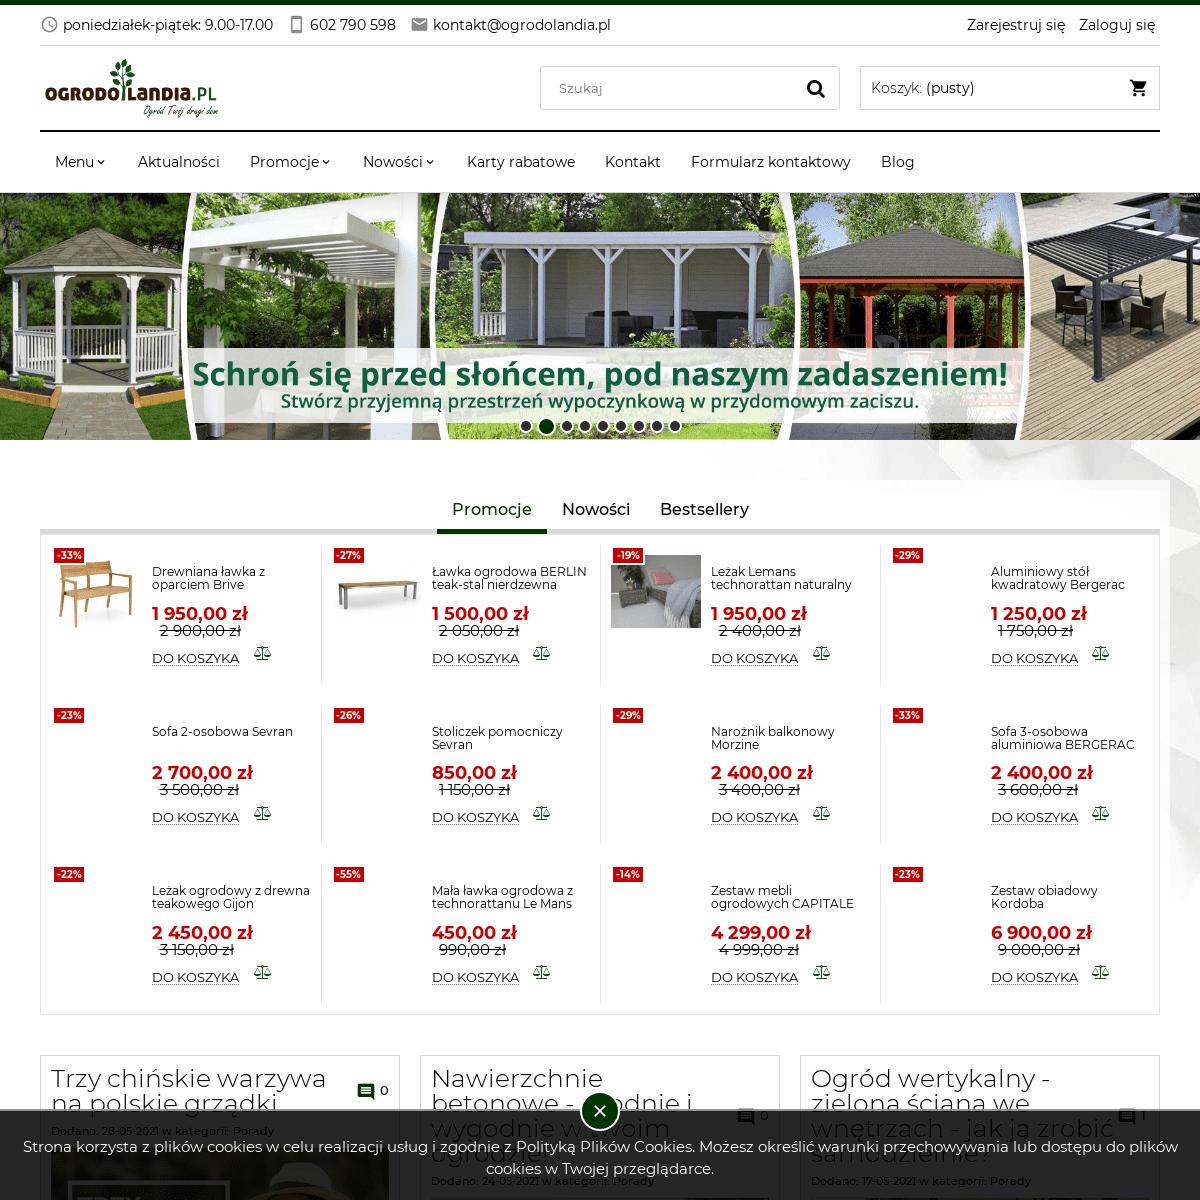 Ogrodolandia.pl - sklep z meblami i architekturą ogrodową